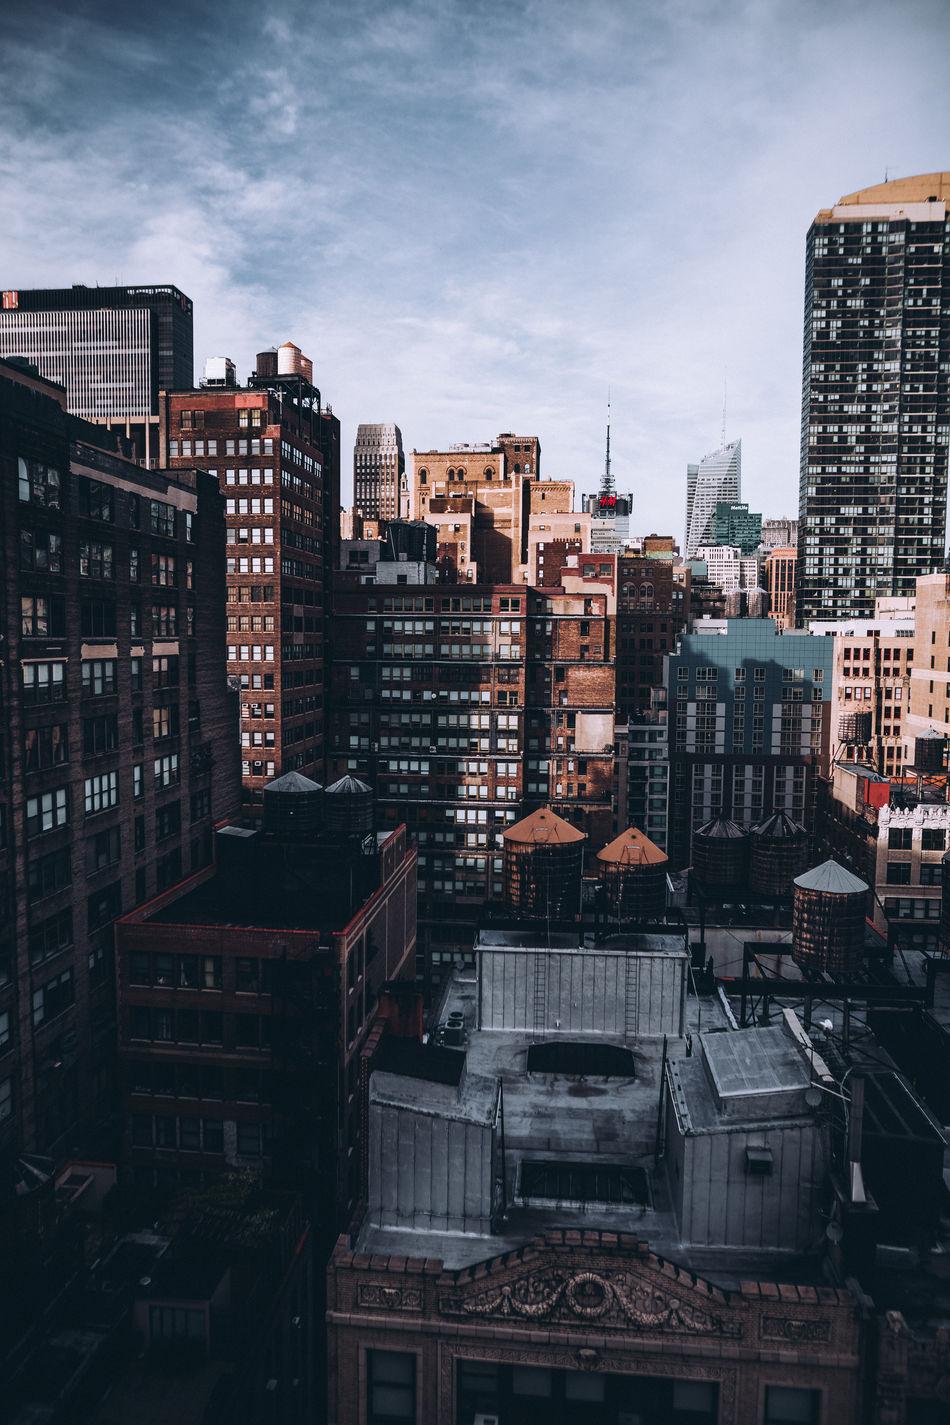 Throwback to visiting the EyeEm team in New York! Architecture Architecture Building Building Exterior Buildings Built Structure City City City Life City Life Cityscape Cloud - Sky Colors EyeEm Best Edits EyeEm Best Shots EyeEm Gallery Modern New York New York City Outdoors Sky Skyscraper Travel Destinations Urban Urban Skyline